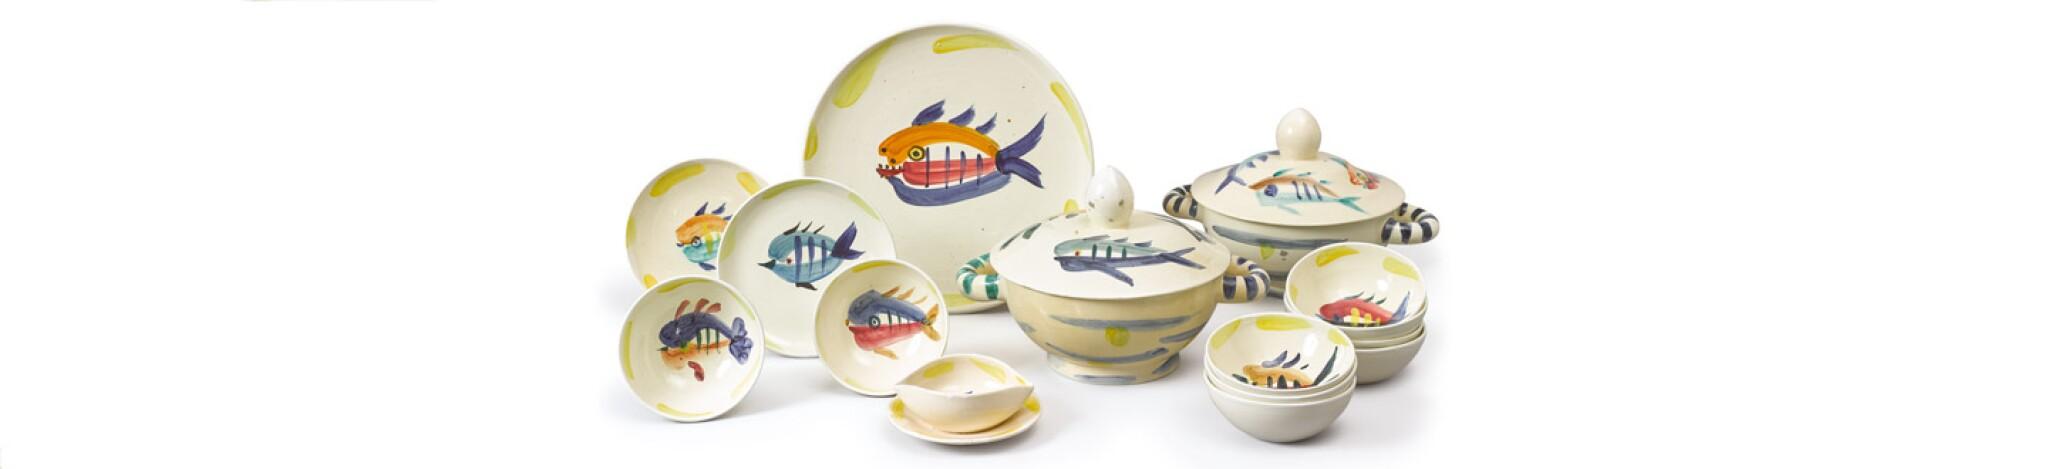 Picasso Prints & Ceramics Online